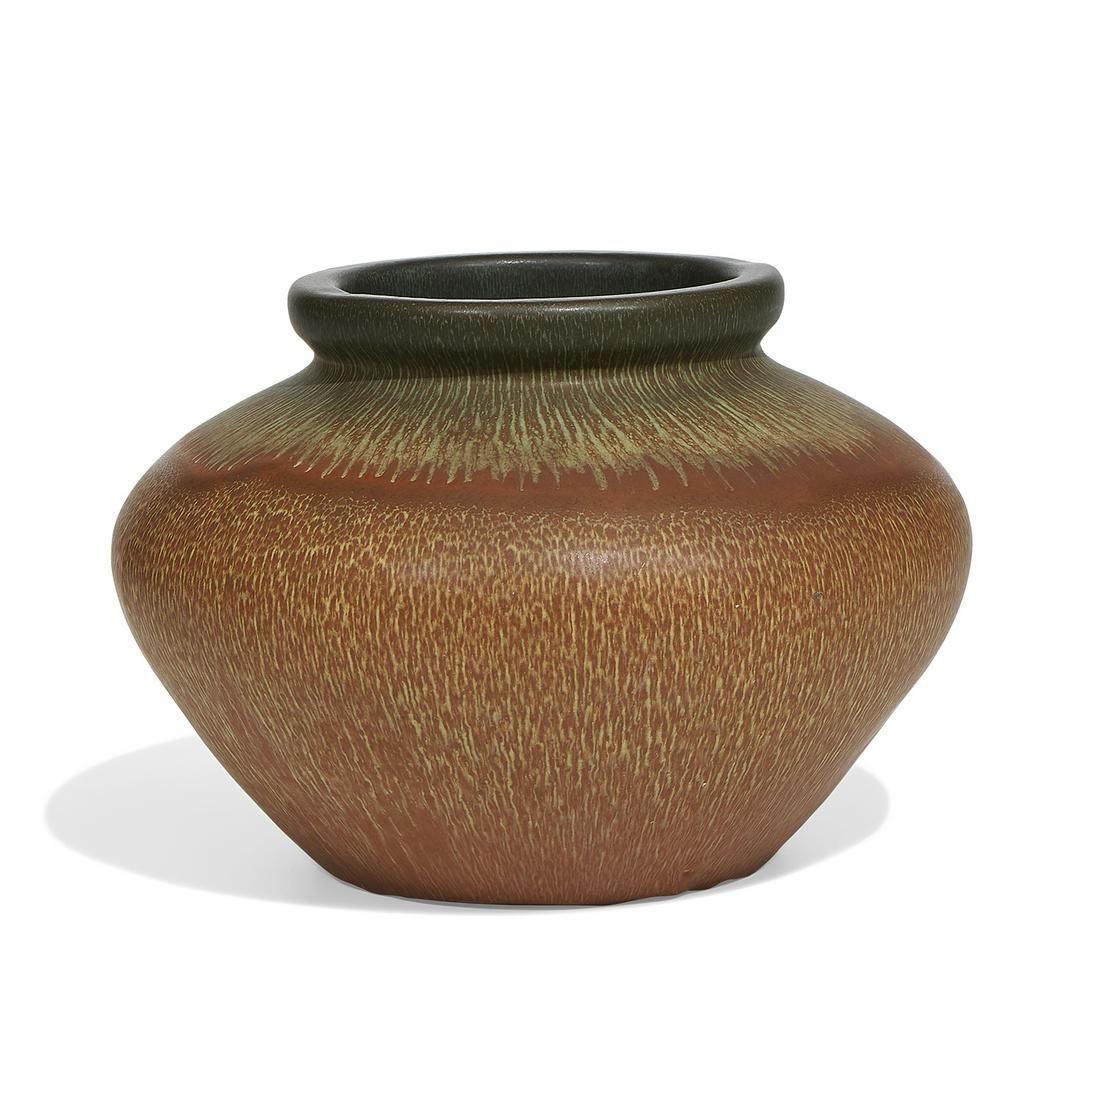 Weller Pottery Co. very large Fruitone vase